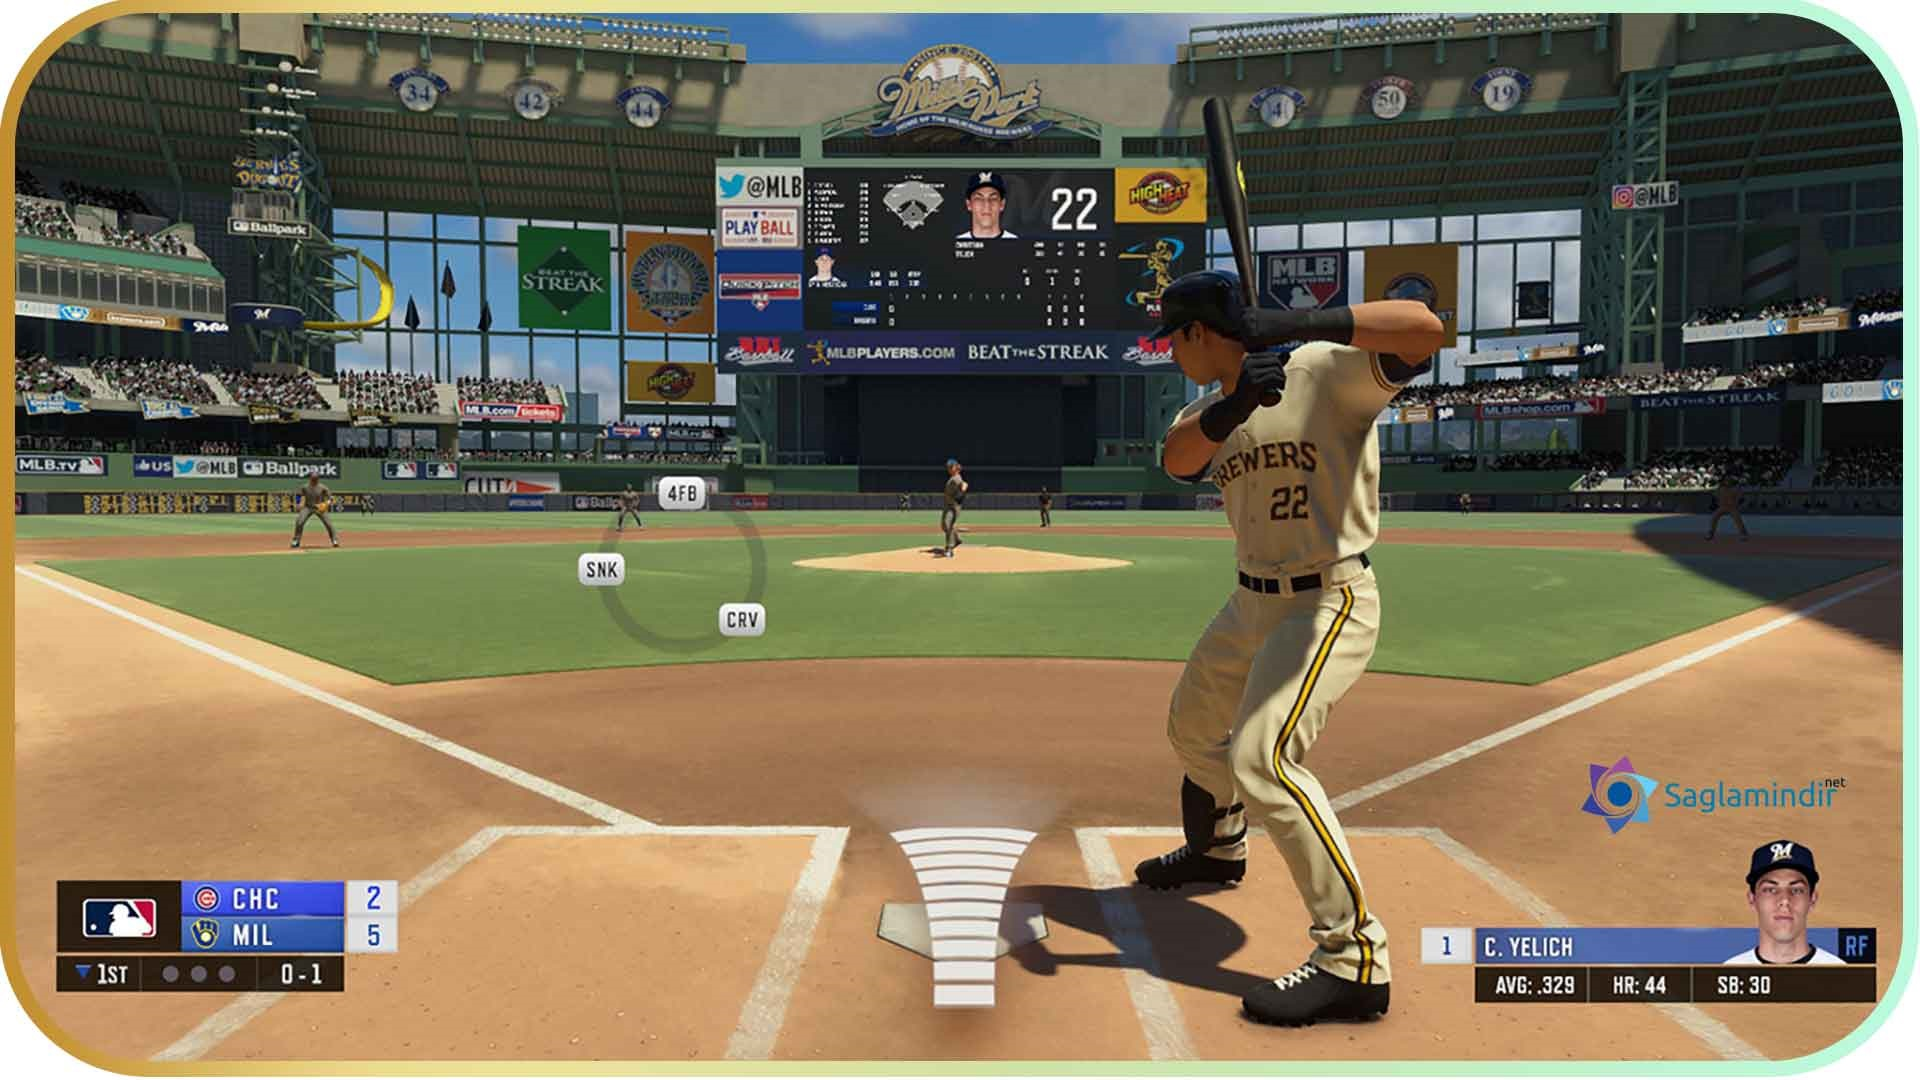 R.B.I. Baseball 20 saglamindir